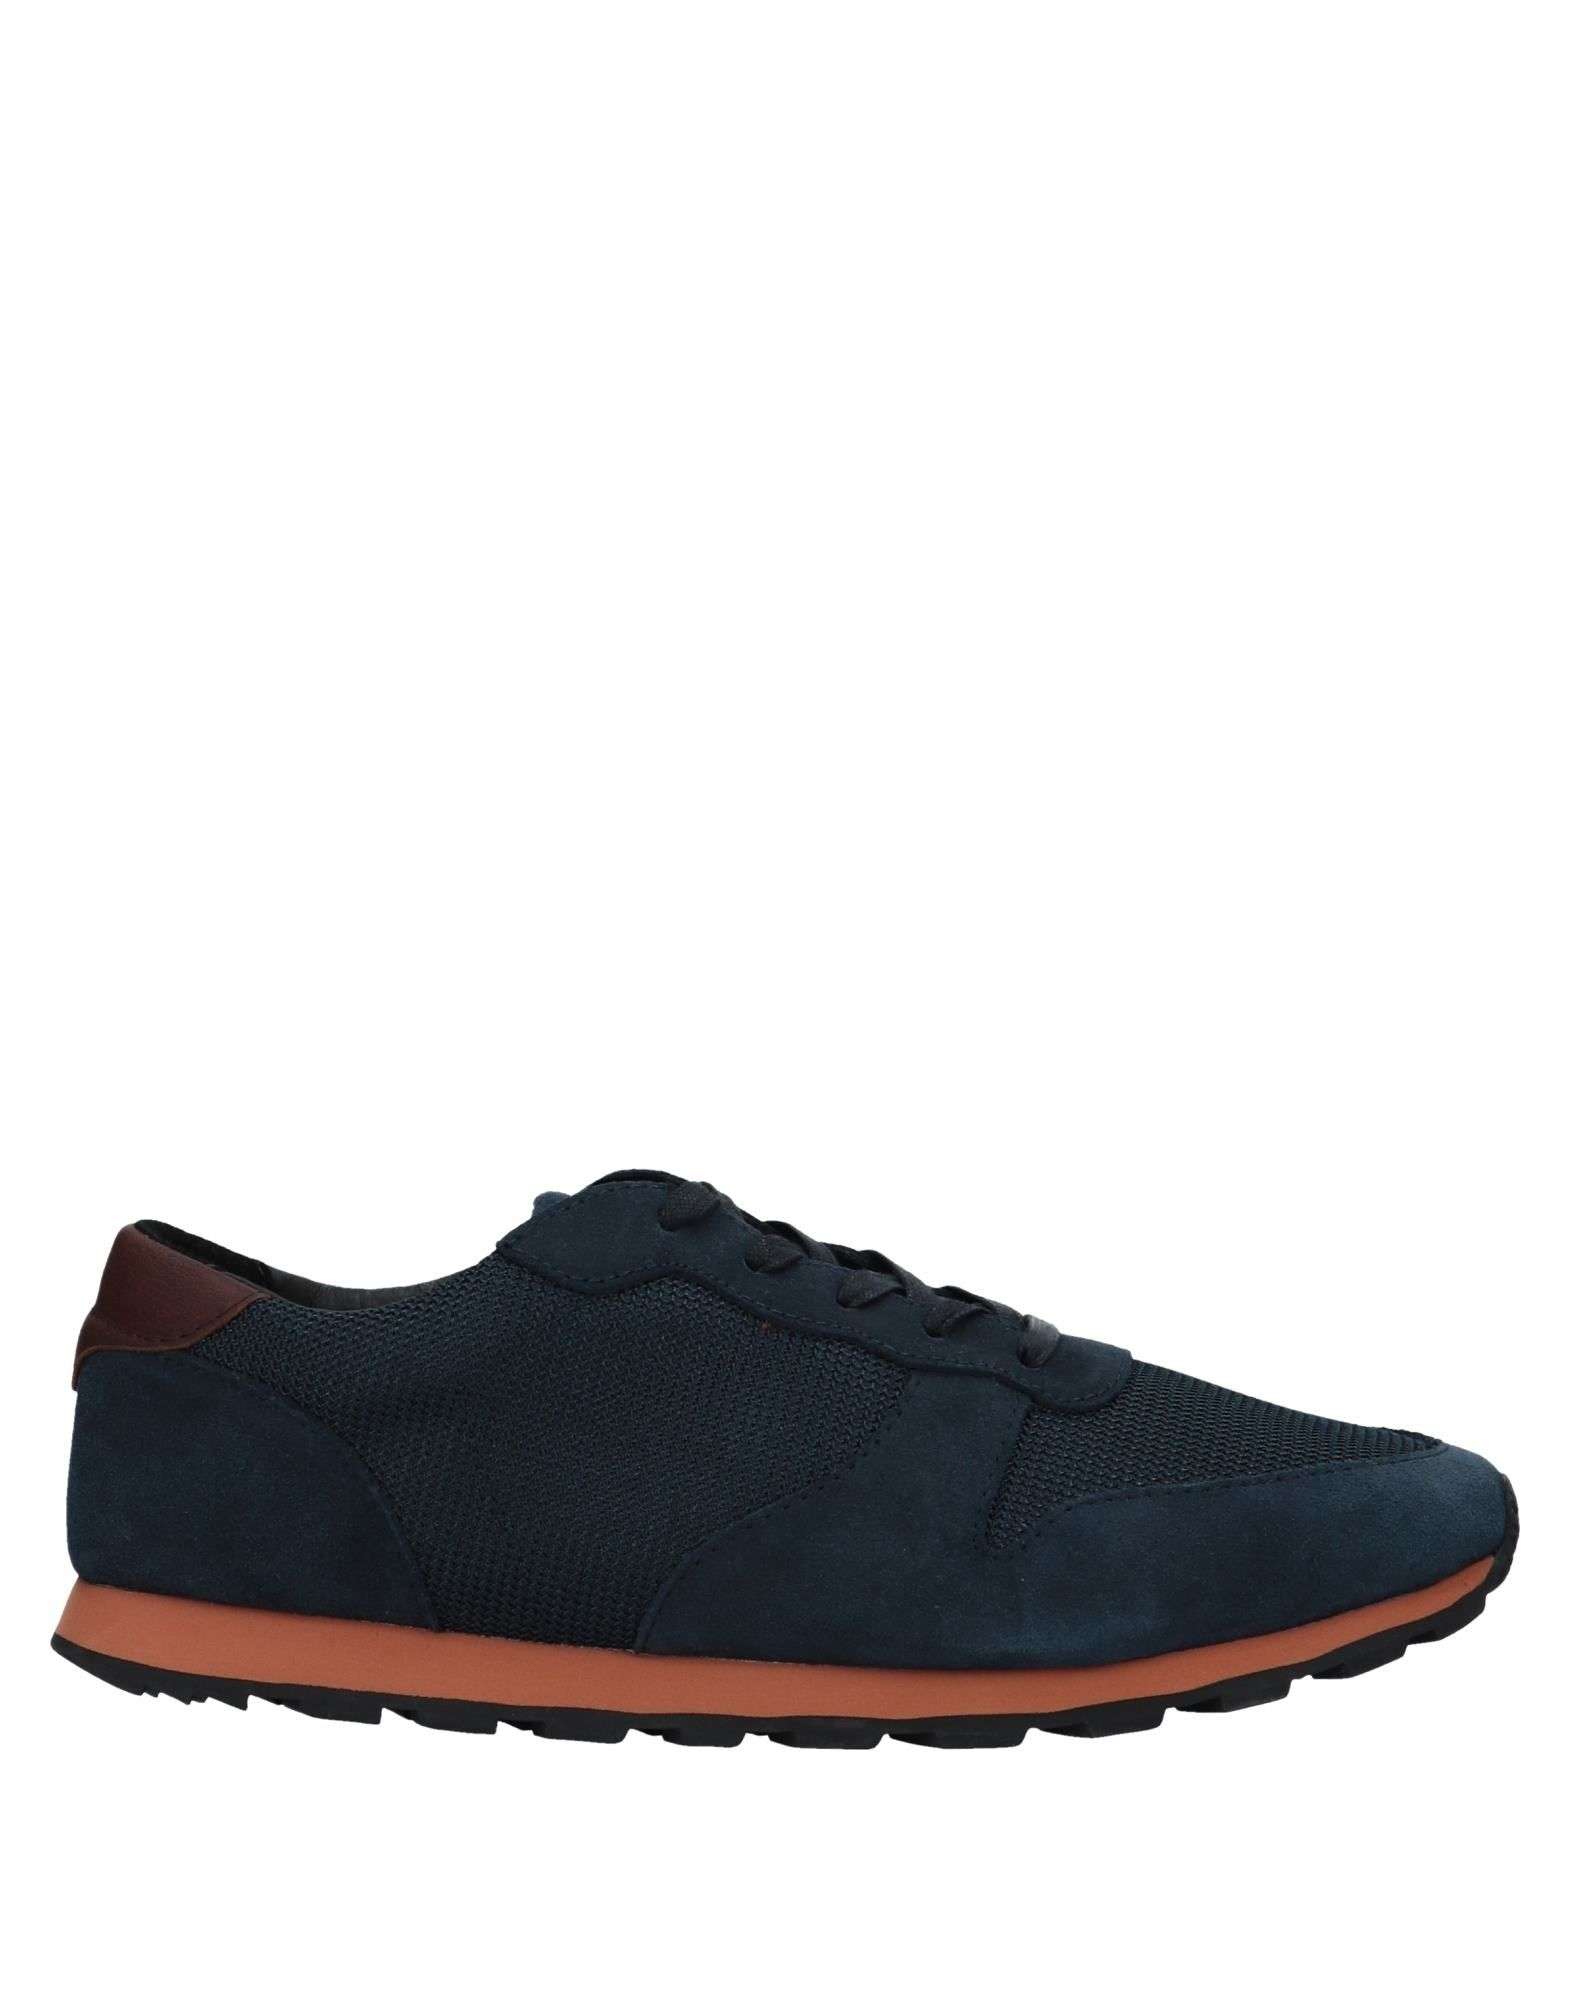 Rabatt echte Schuhe Herren Clae Sneakers Herren Schuhe  11509118KO 2998ad